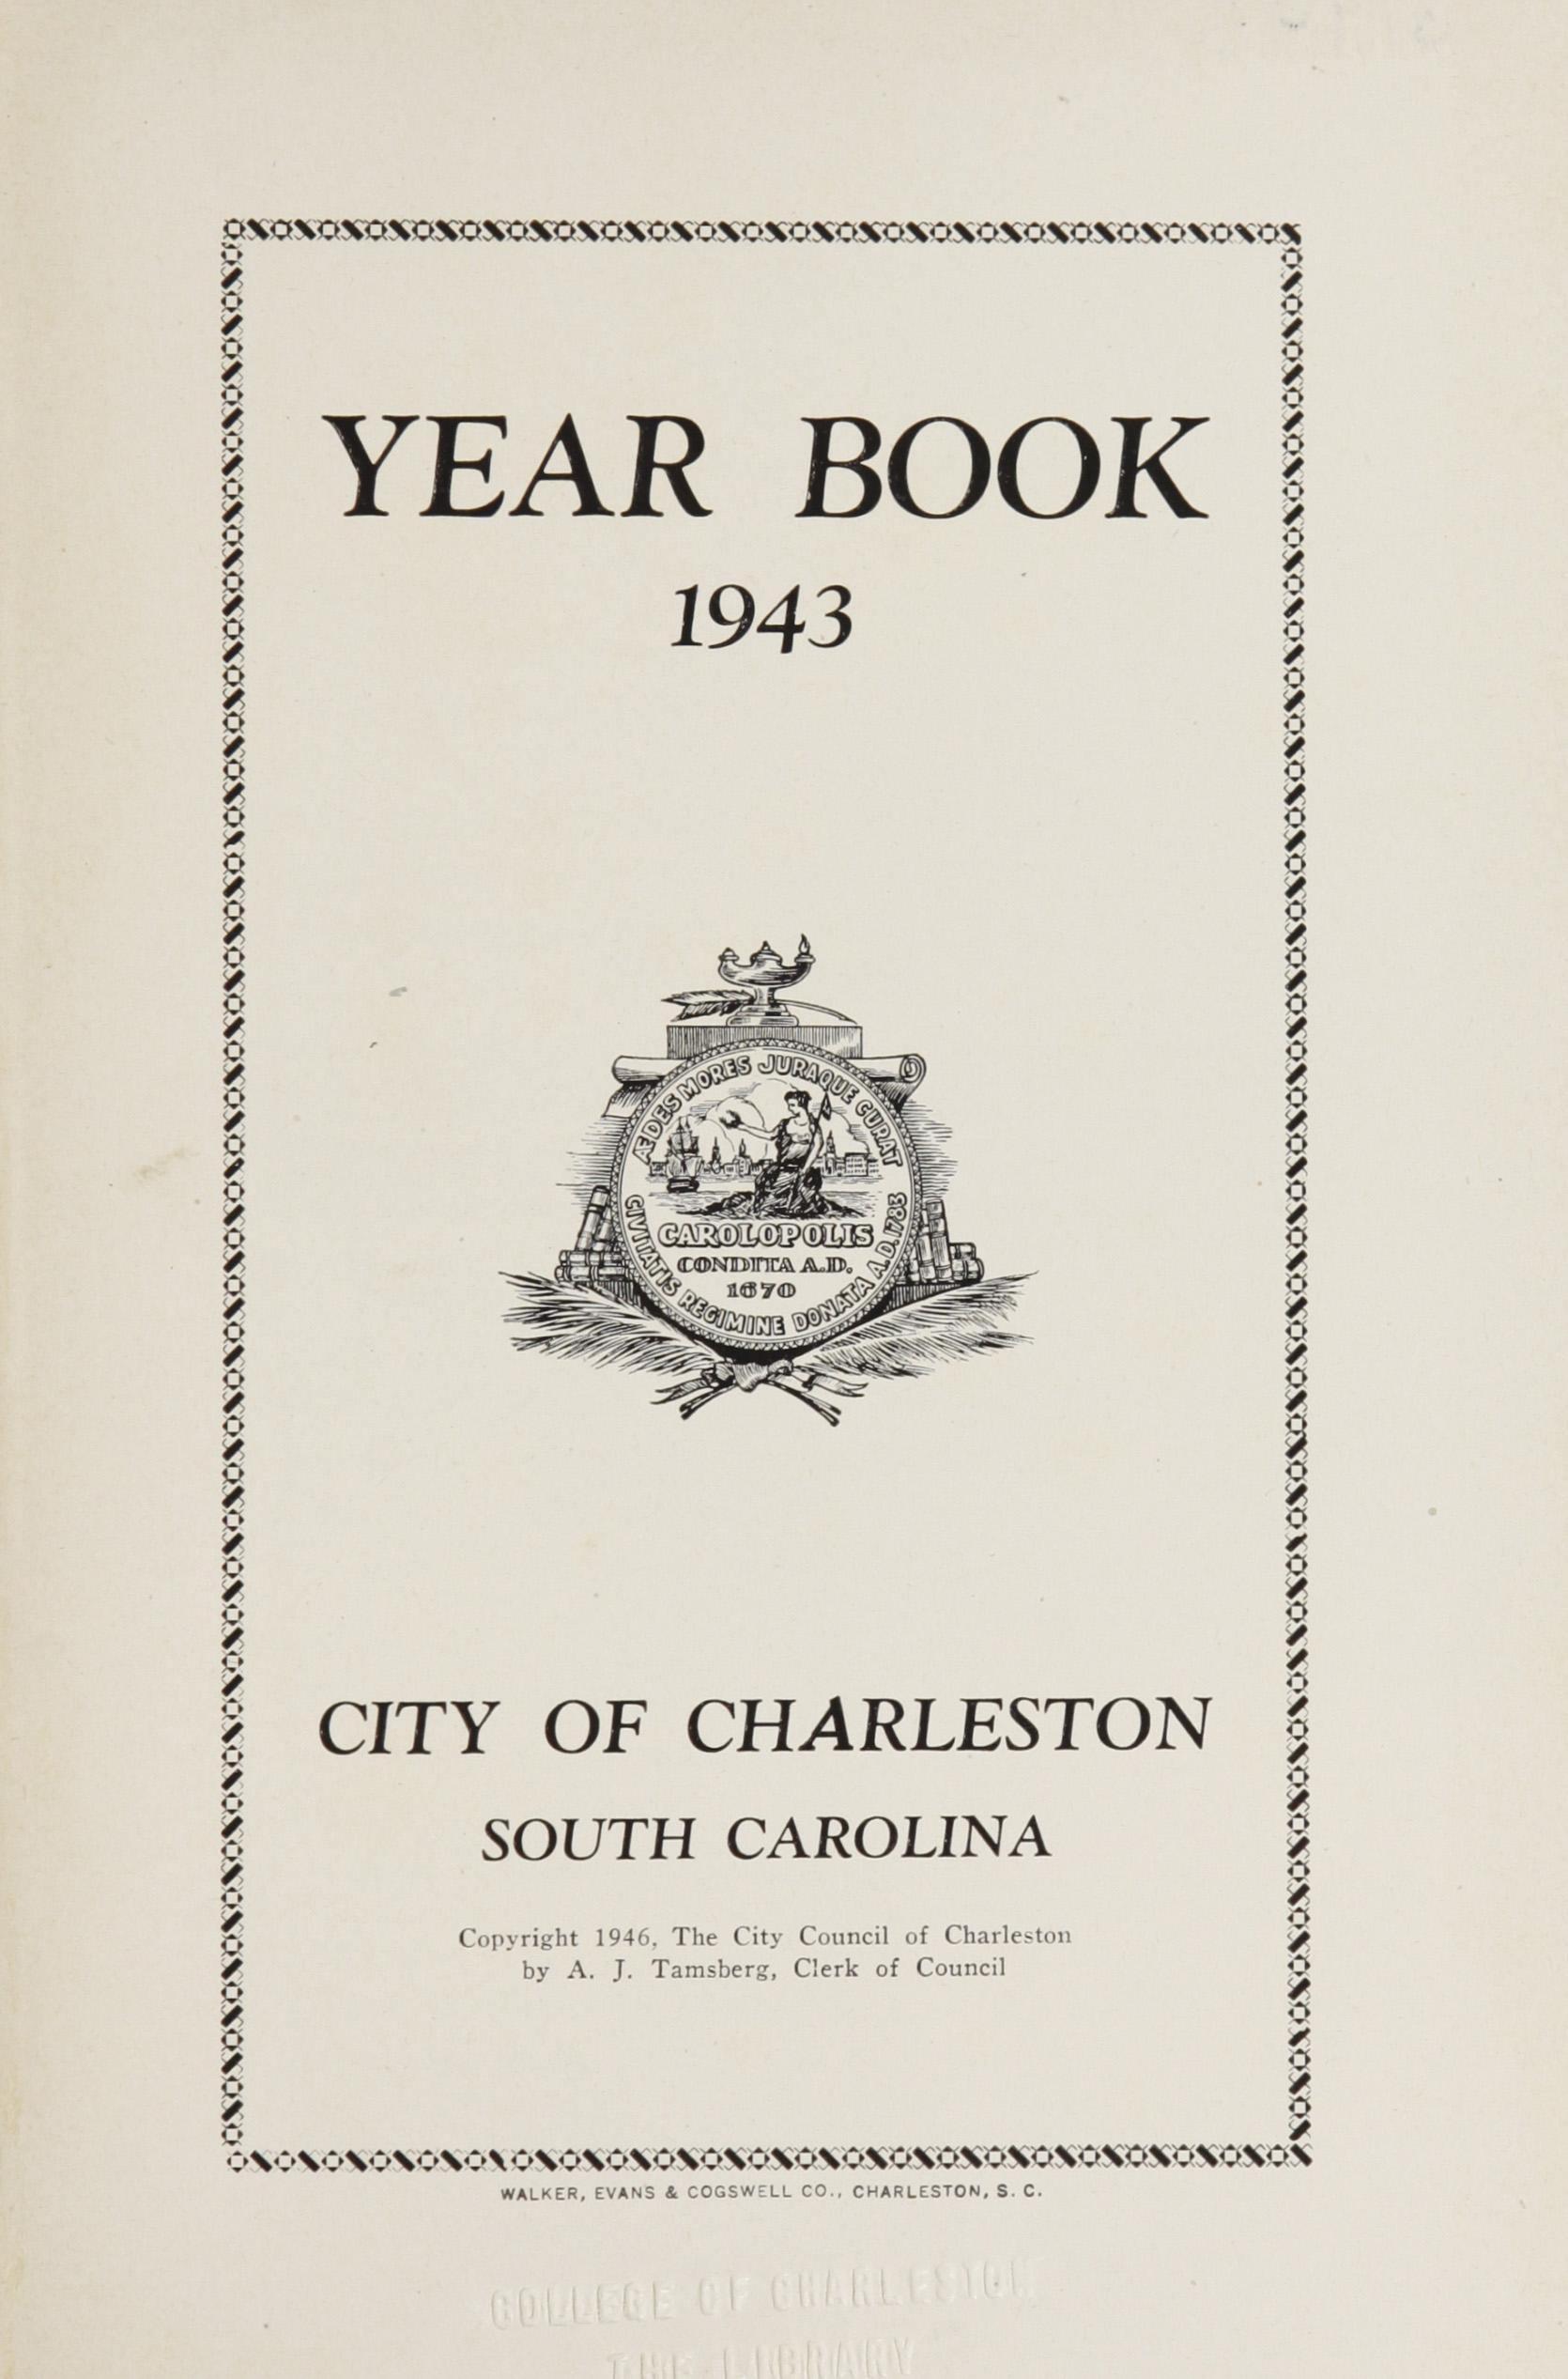 Charleston Yearbook, 1943, page 1